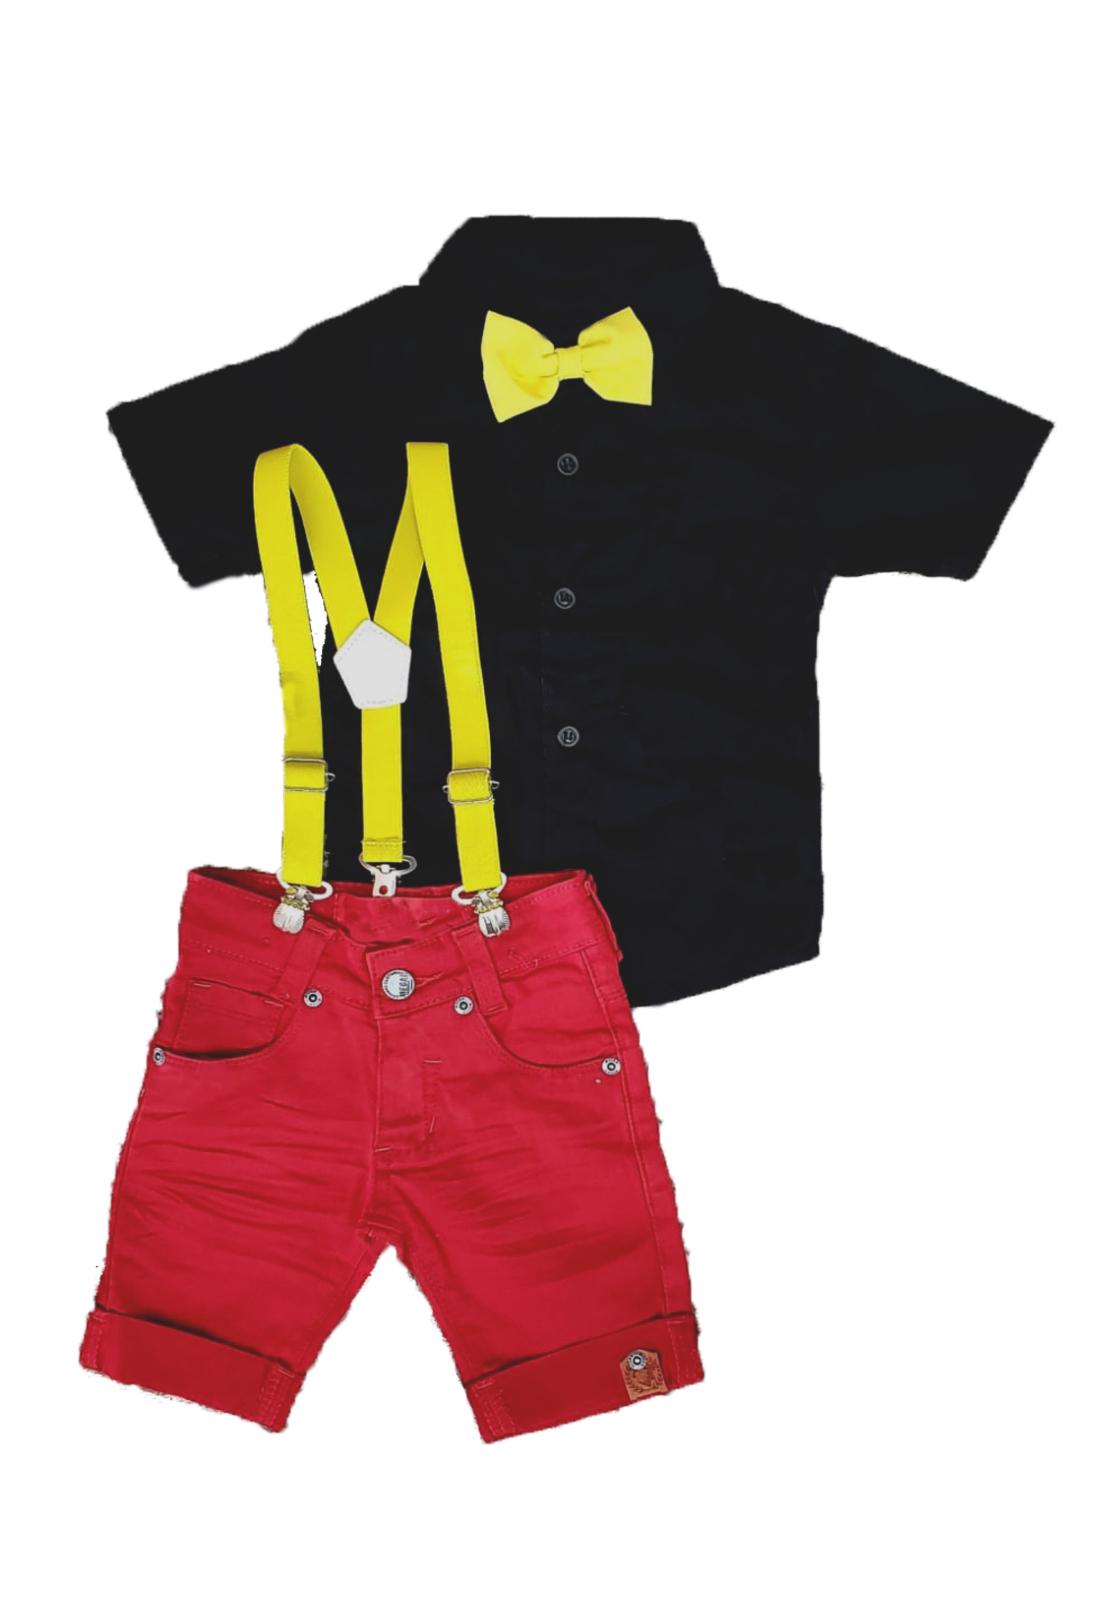 Look Menino Camisa Social E Calca Jeans Com Kit Suspensorio